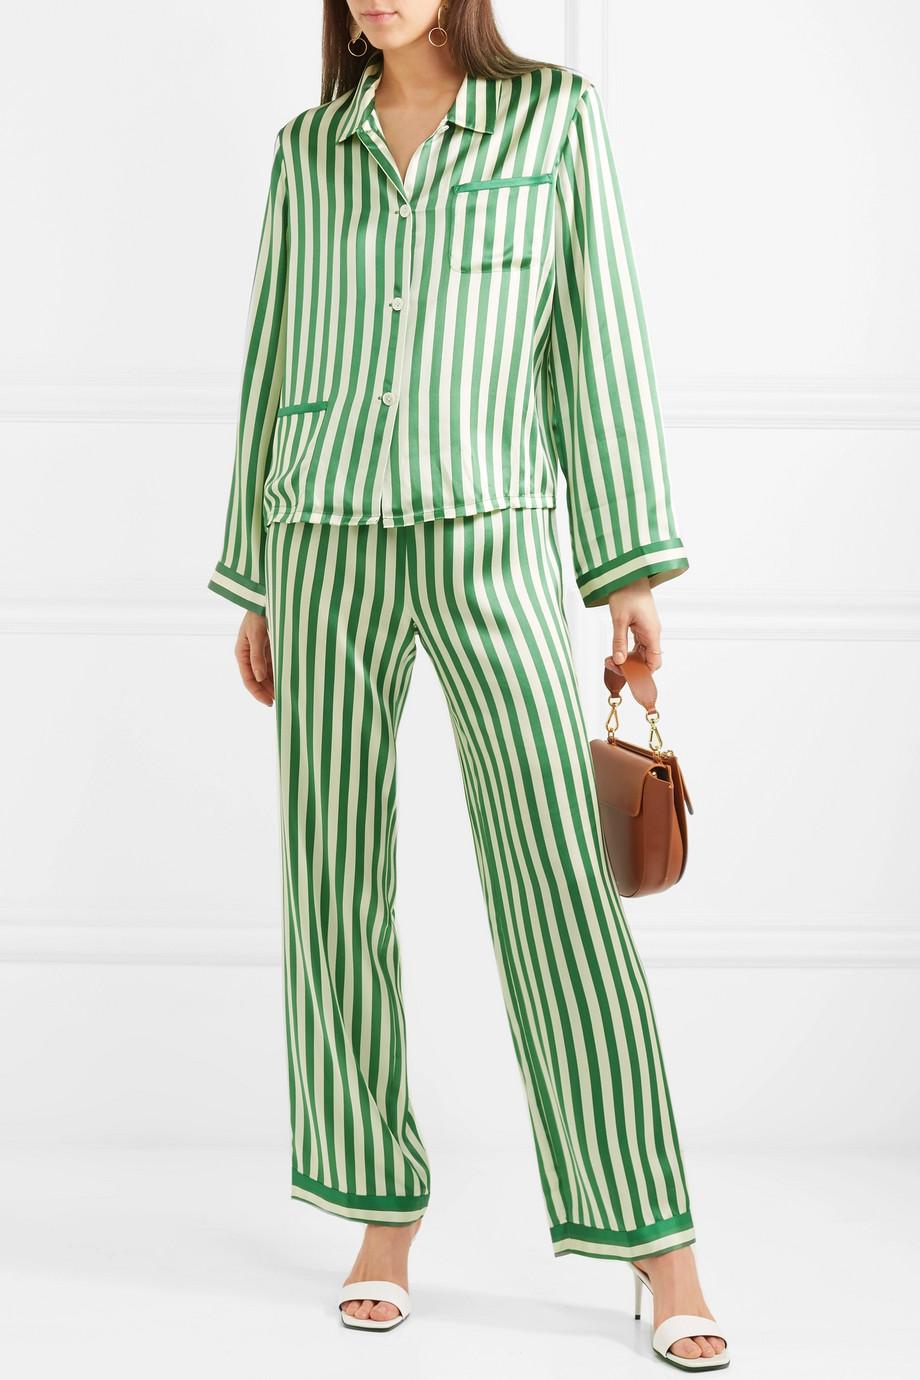 6e405168685 Best Pajamas - Cute